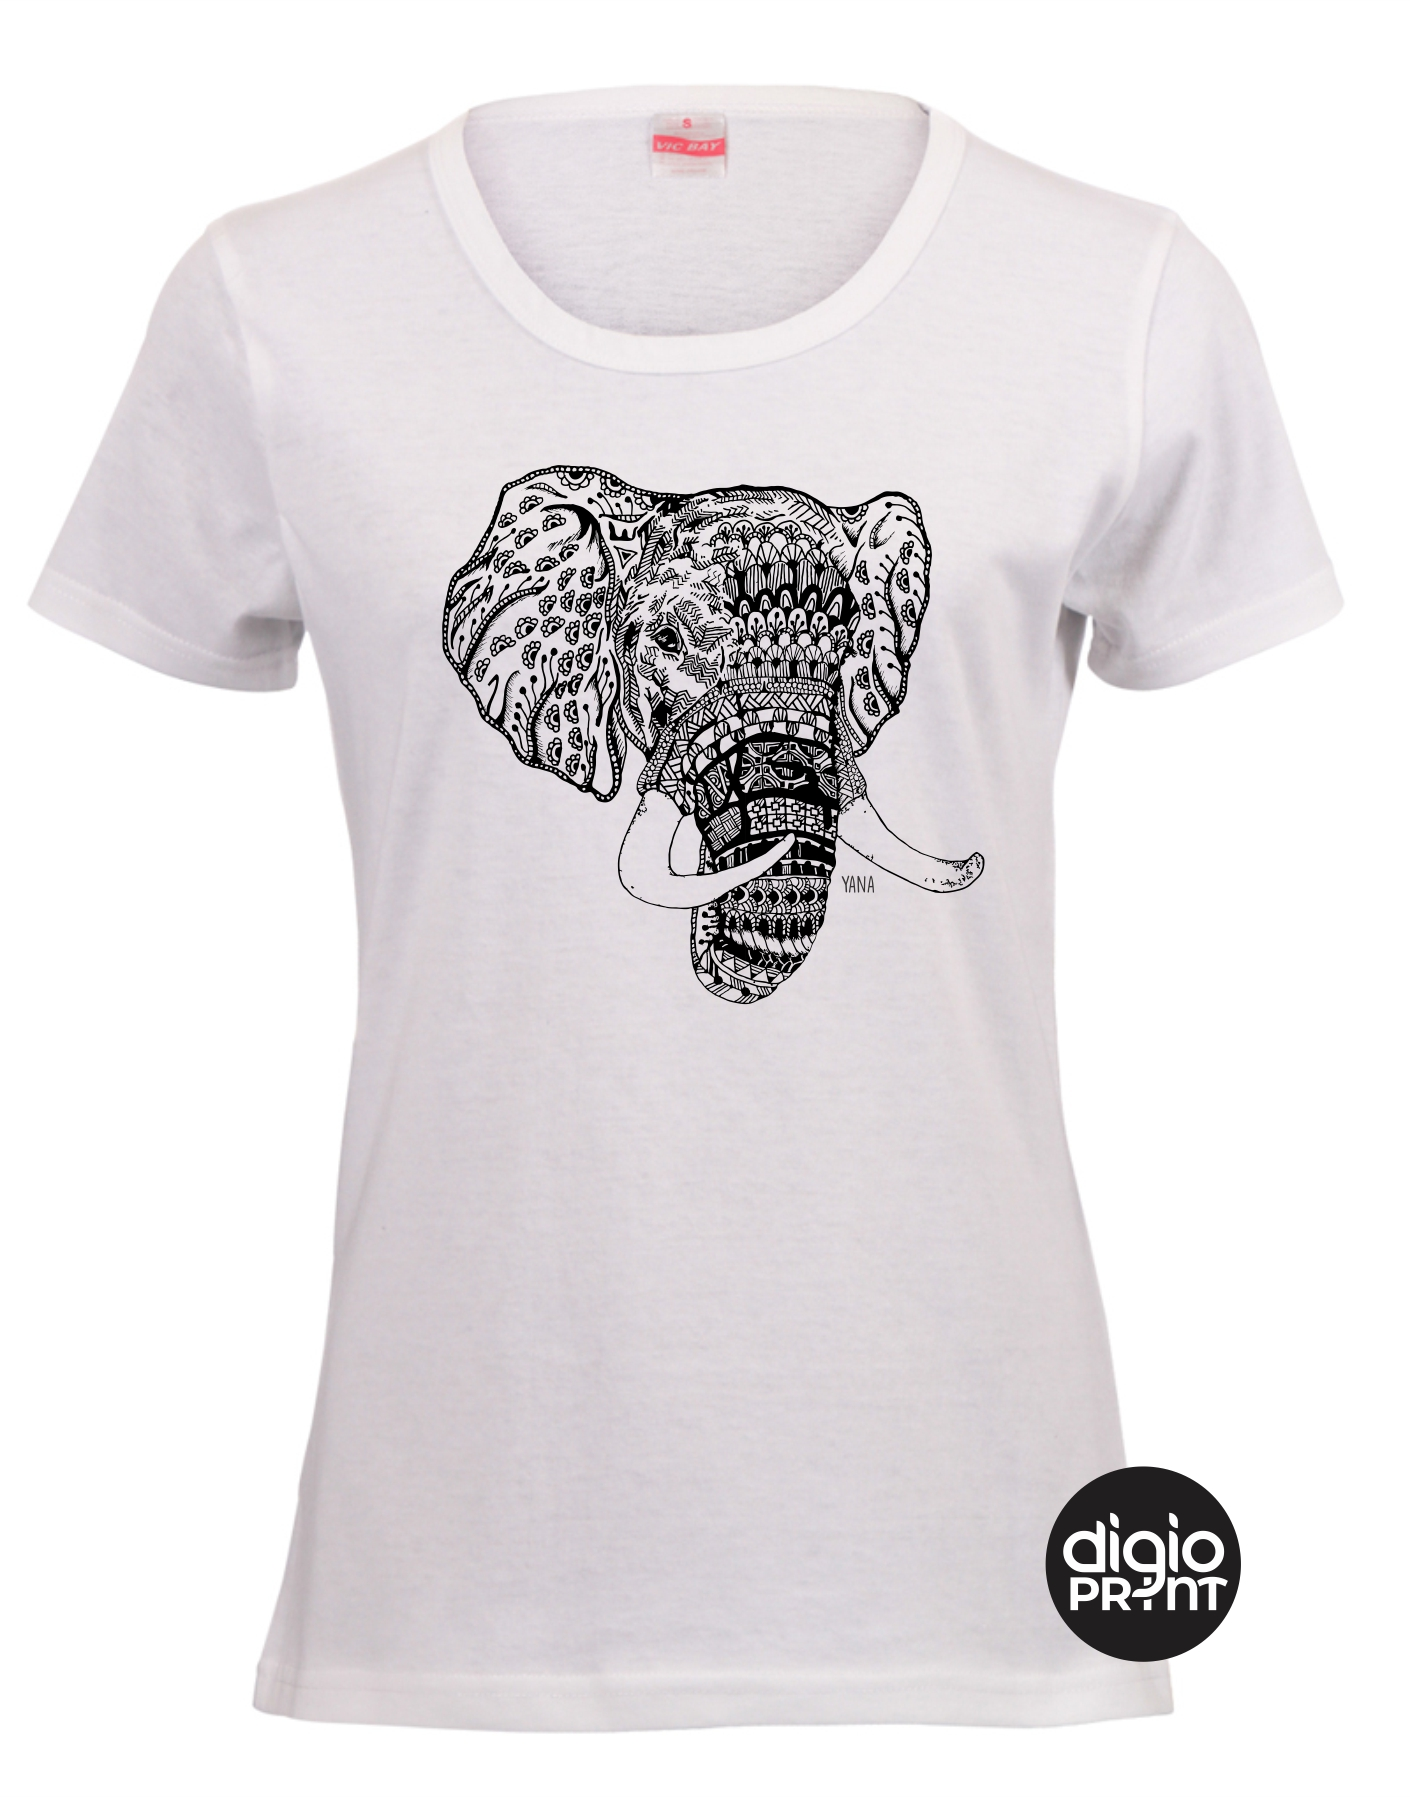 Yana Elephant Fitted T-shirt